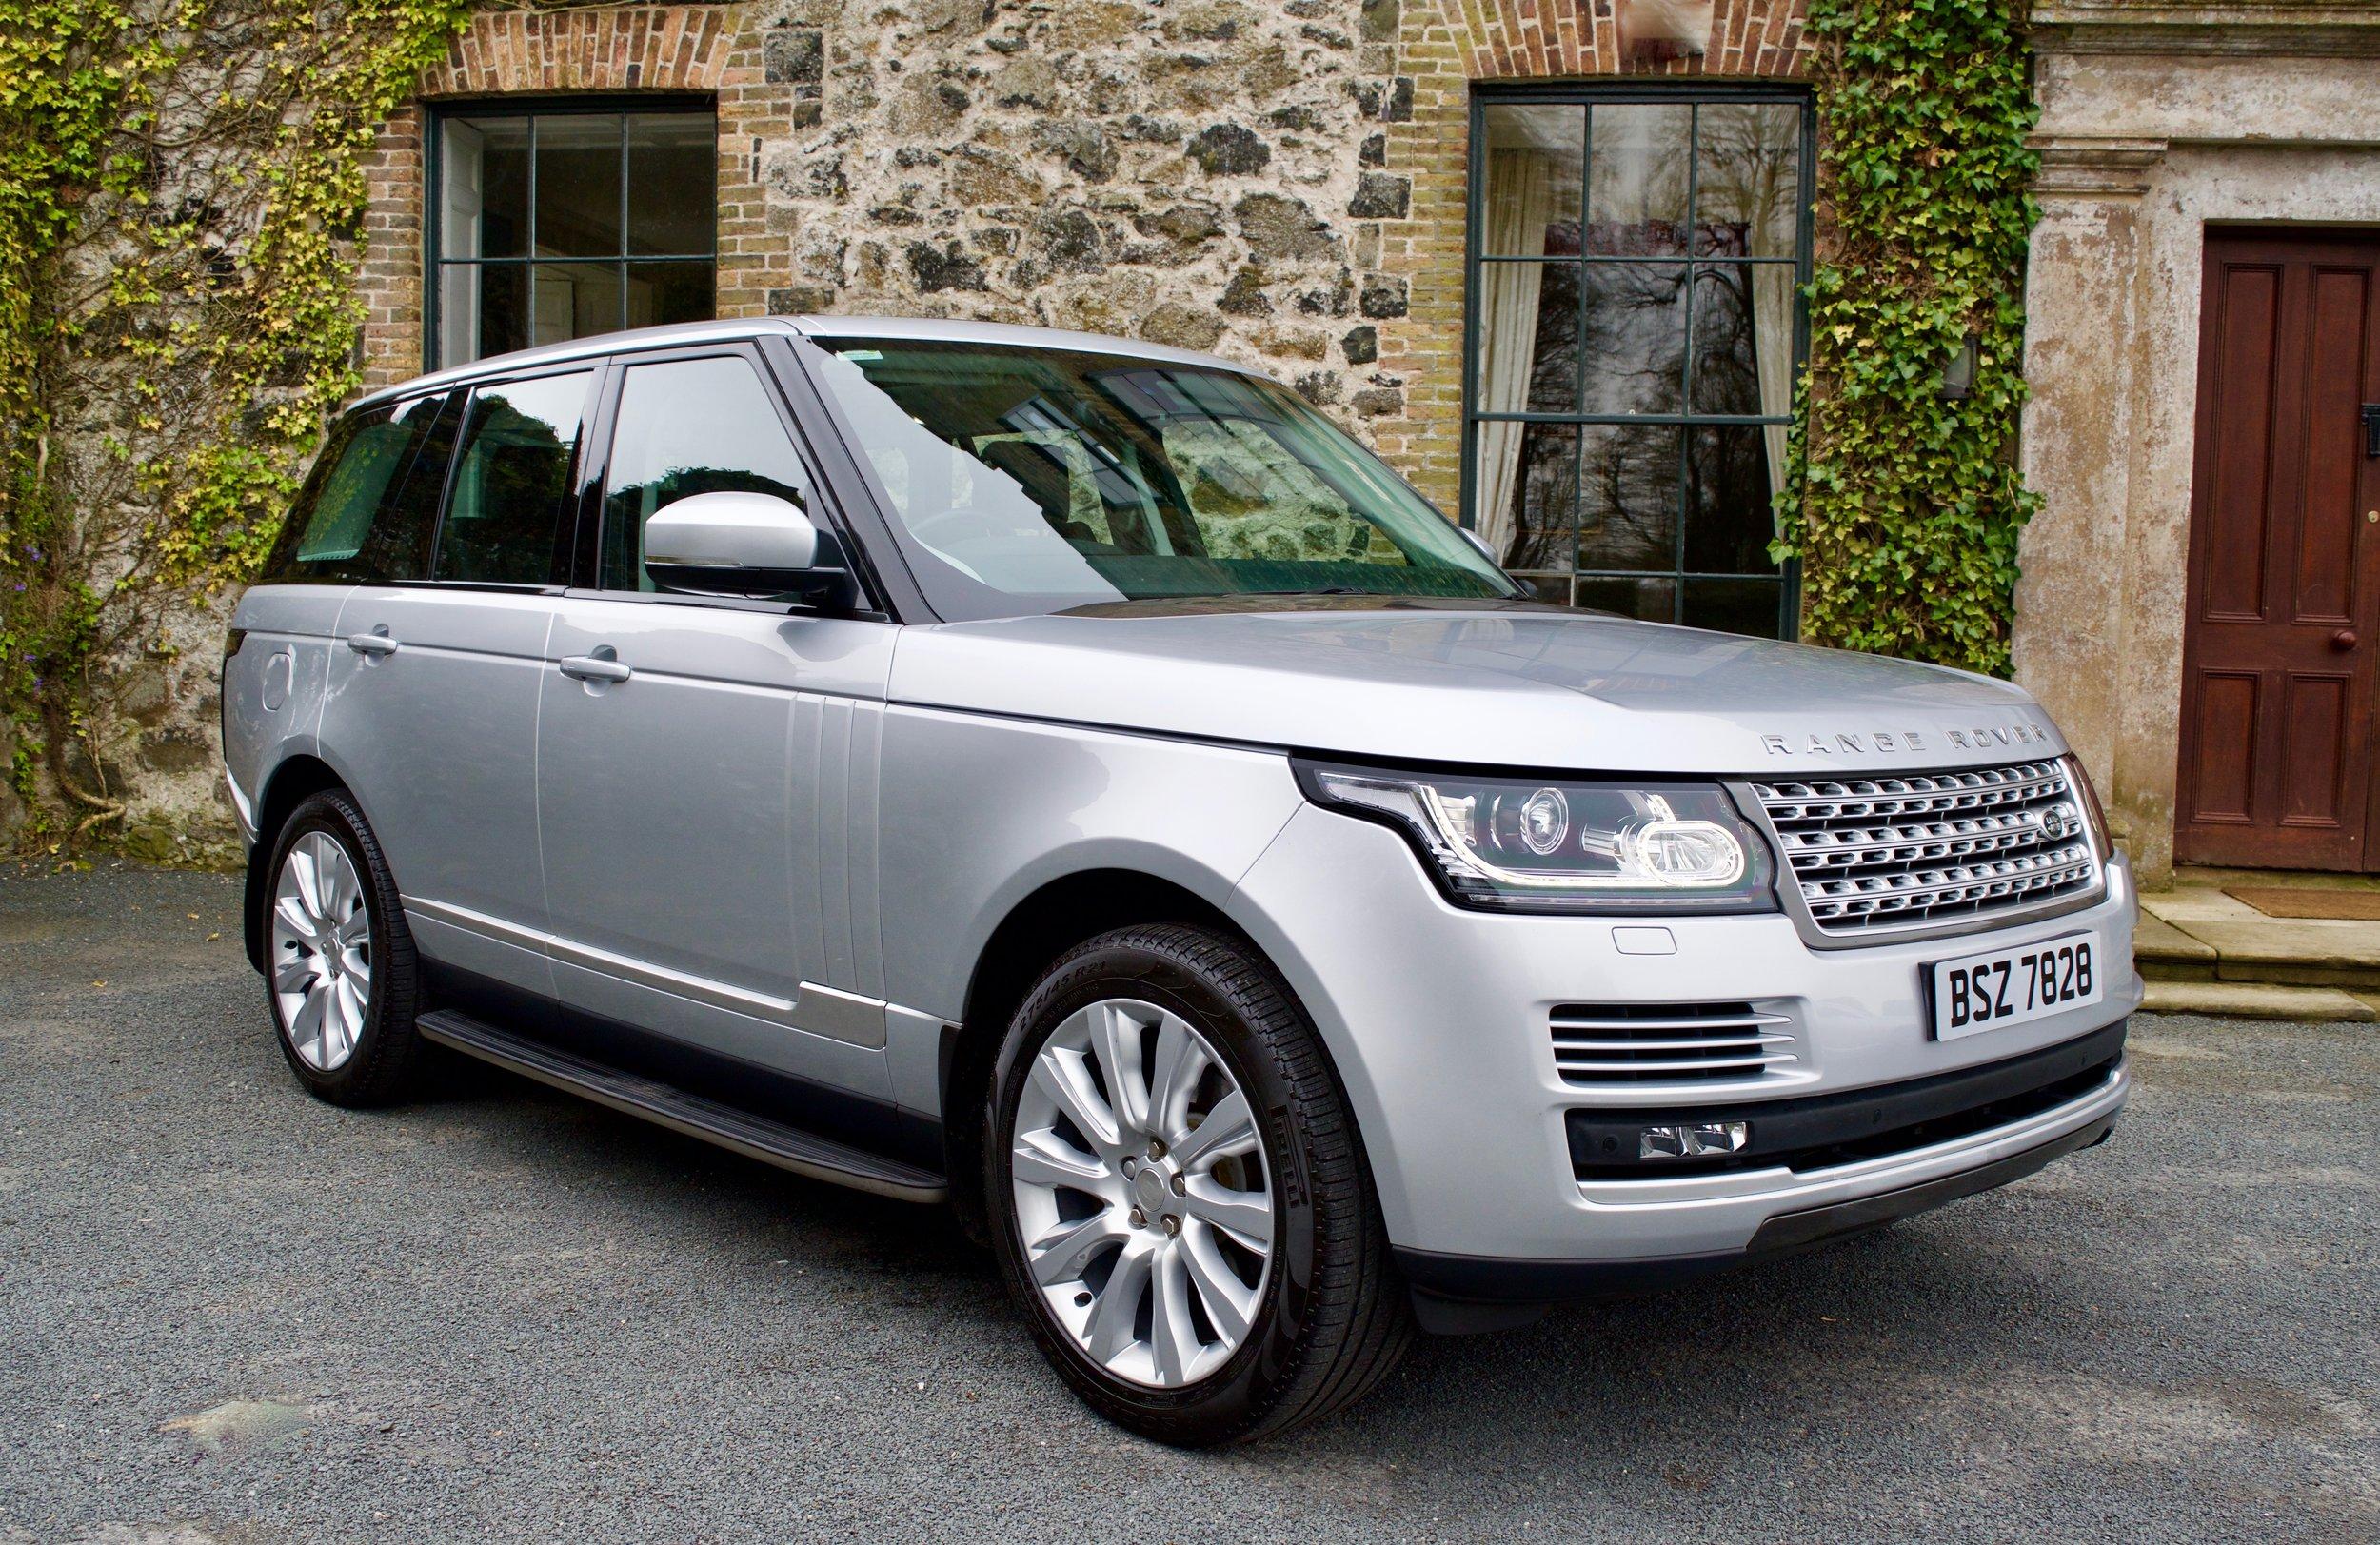 2014 Range Rover Vogue SE